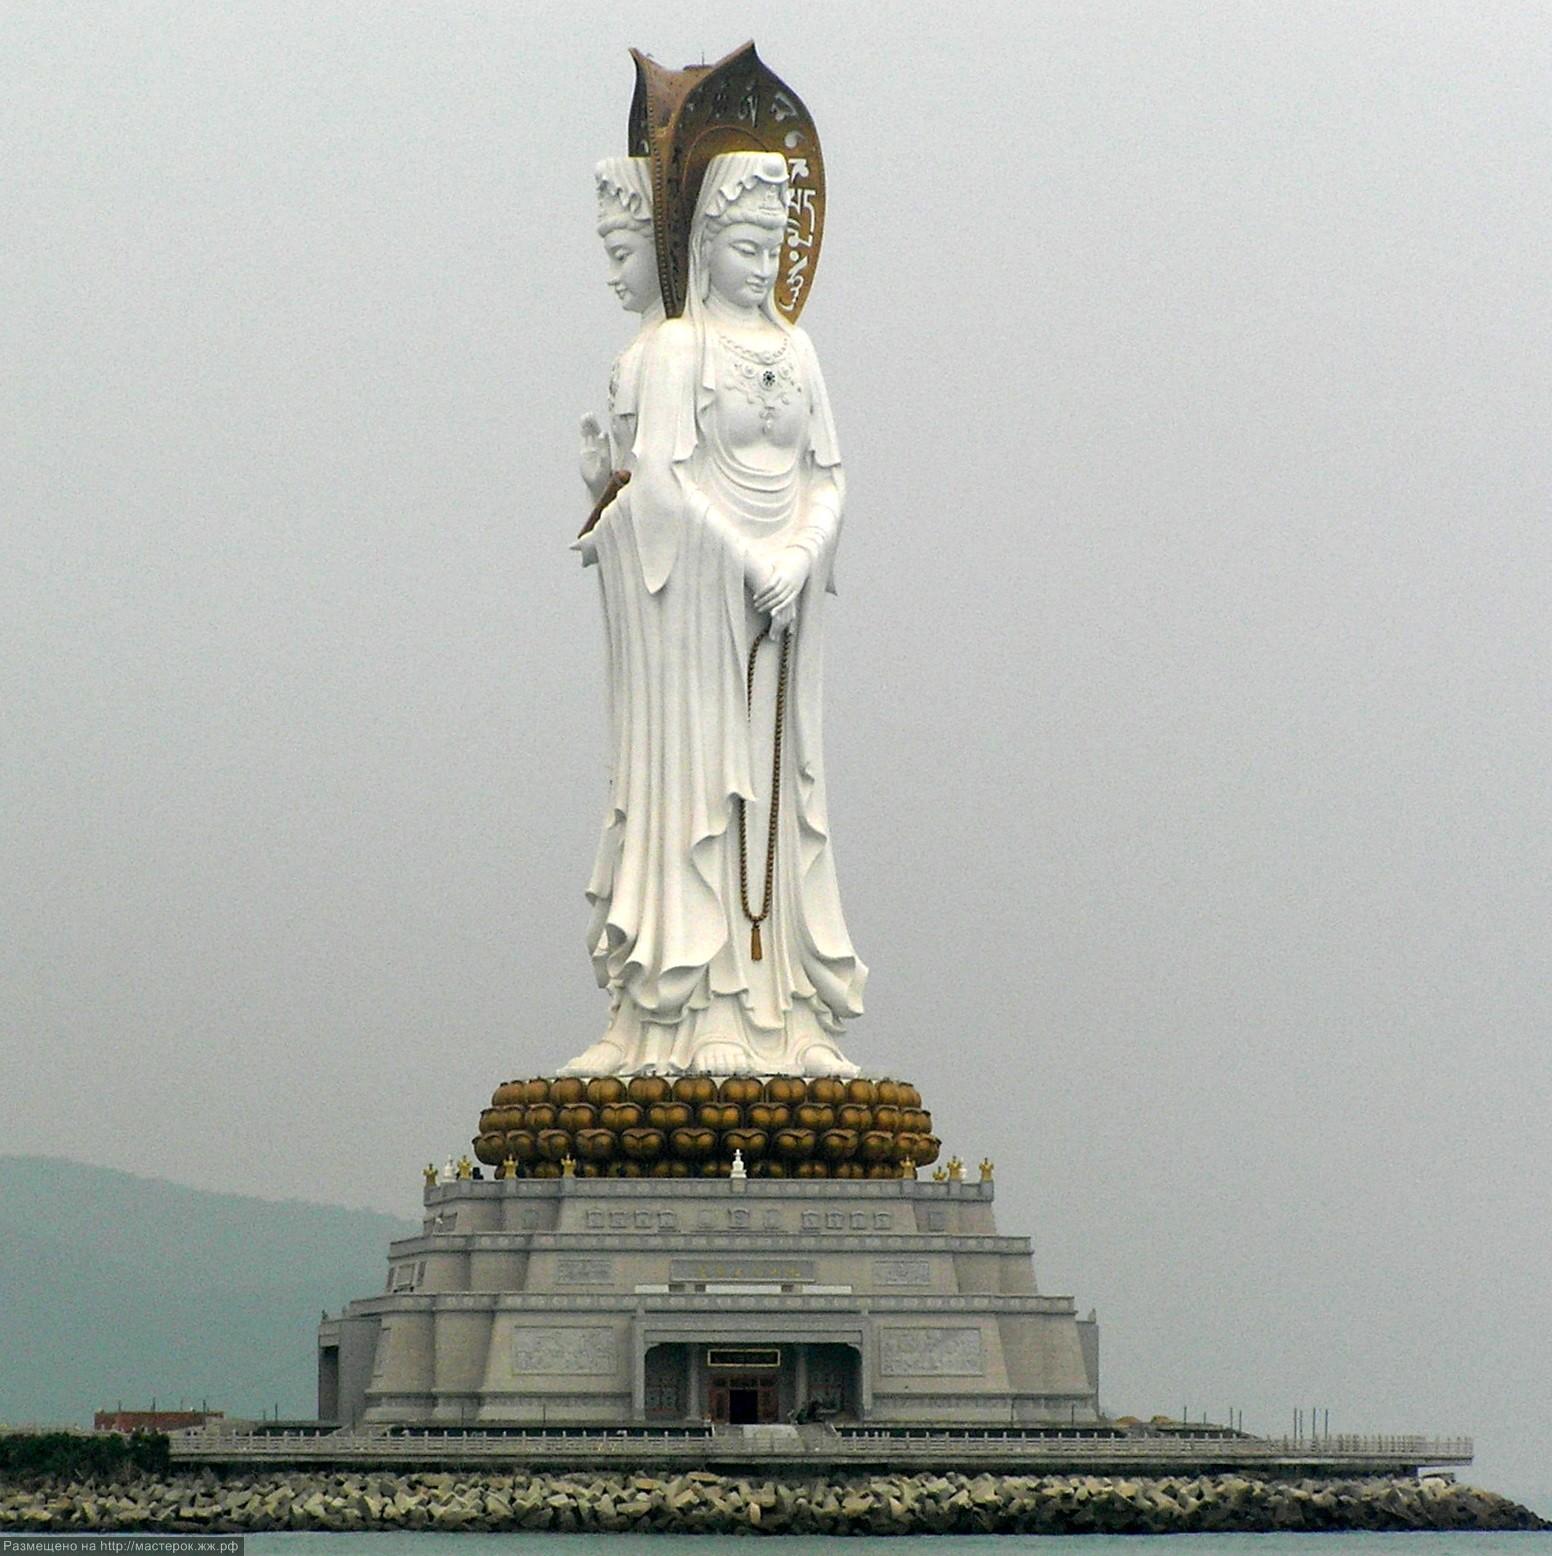 108-meter  three-aspect Bodhisattva Guanyin statue. Sanya Nanshan Buddhism Cultural Tourism Zone